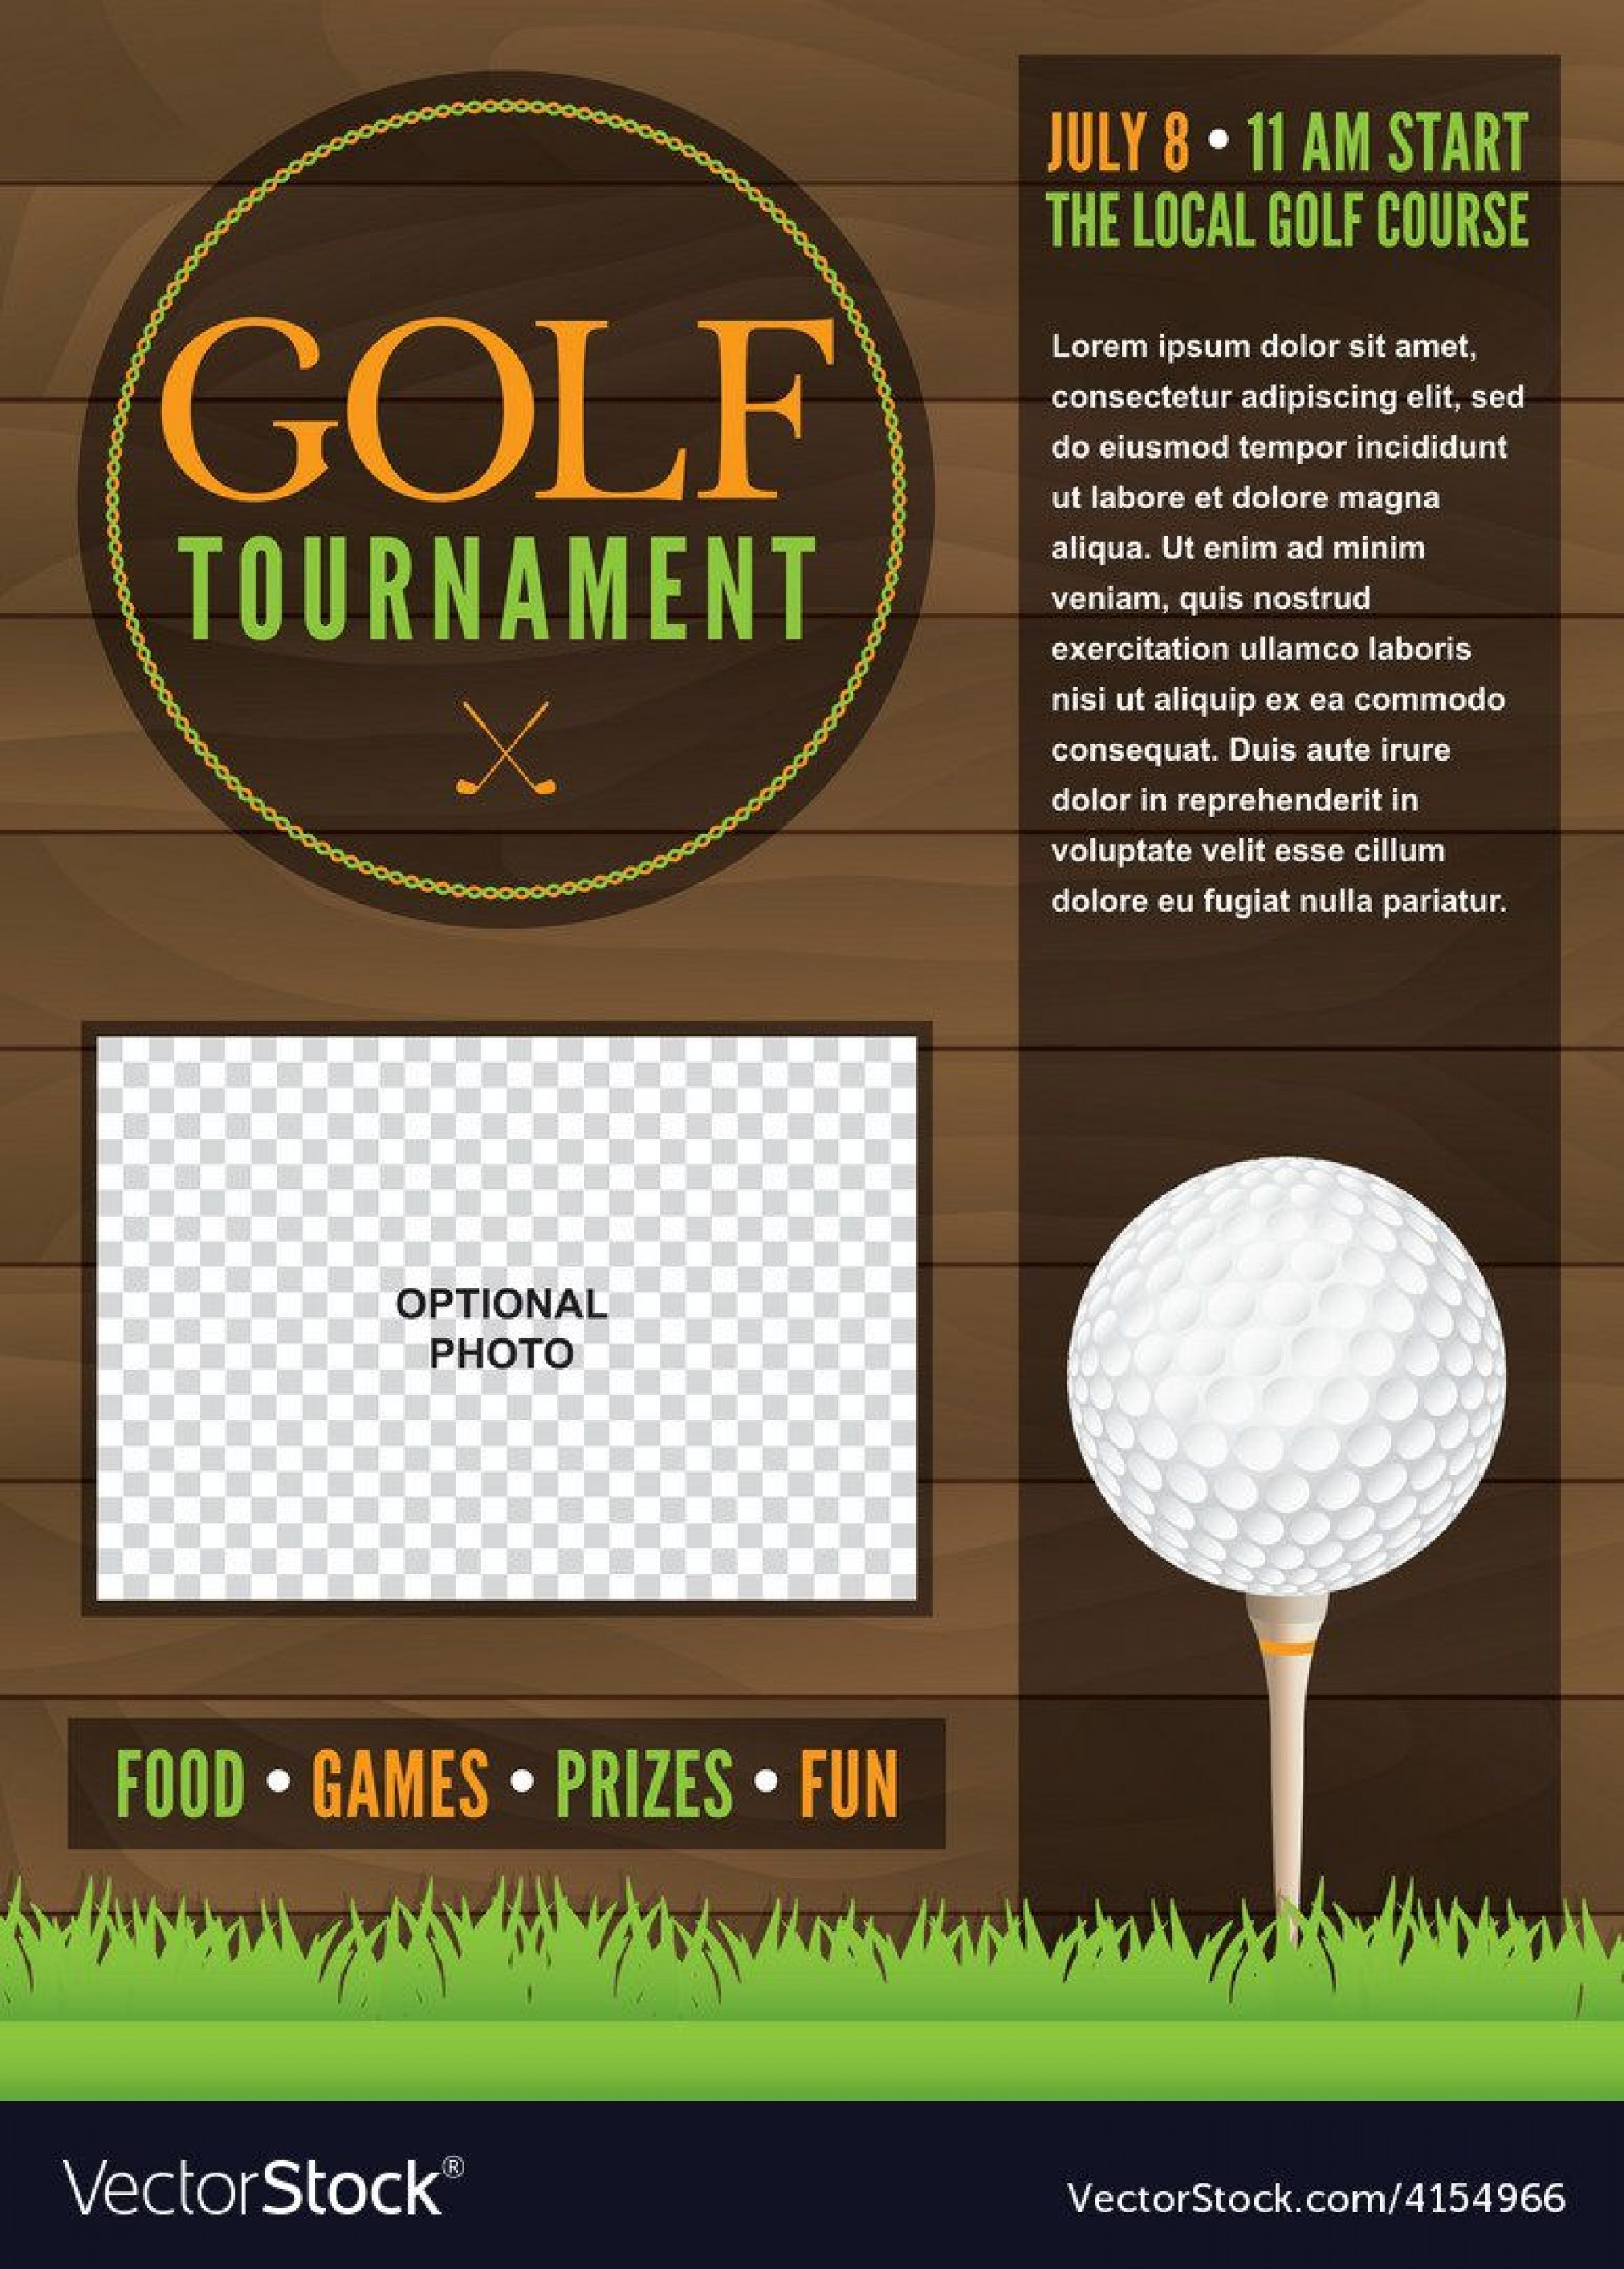 008 Simple Golf Tournament Flyer Template Design  Word Free Pdf1920